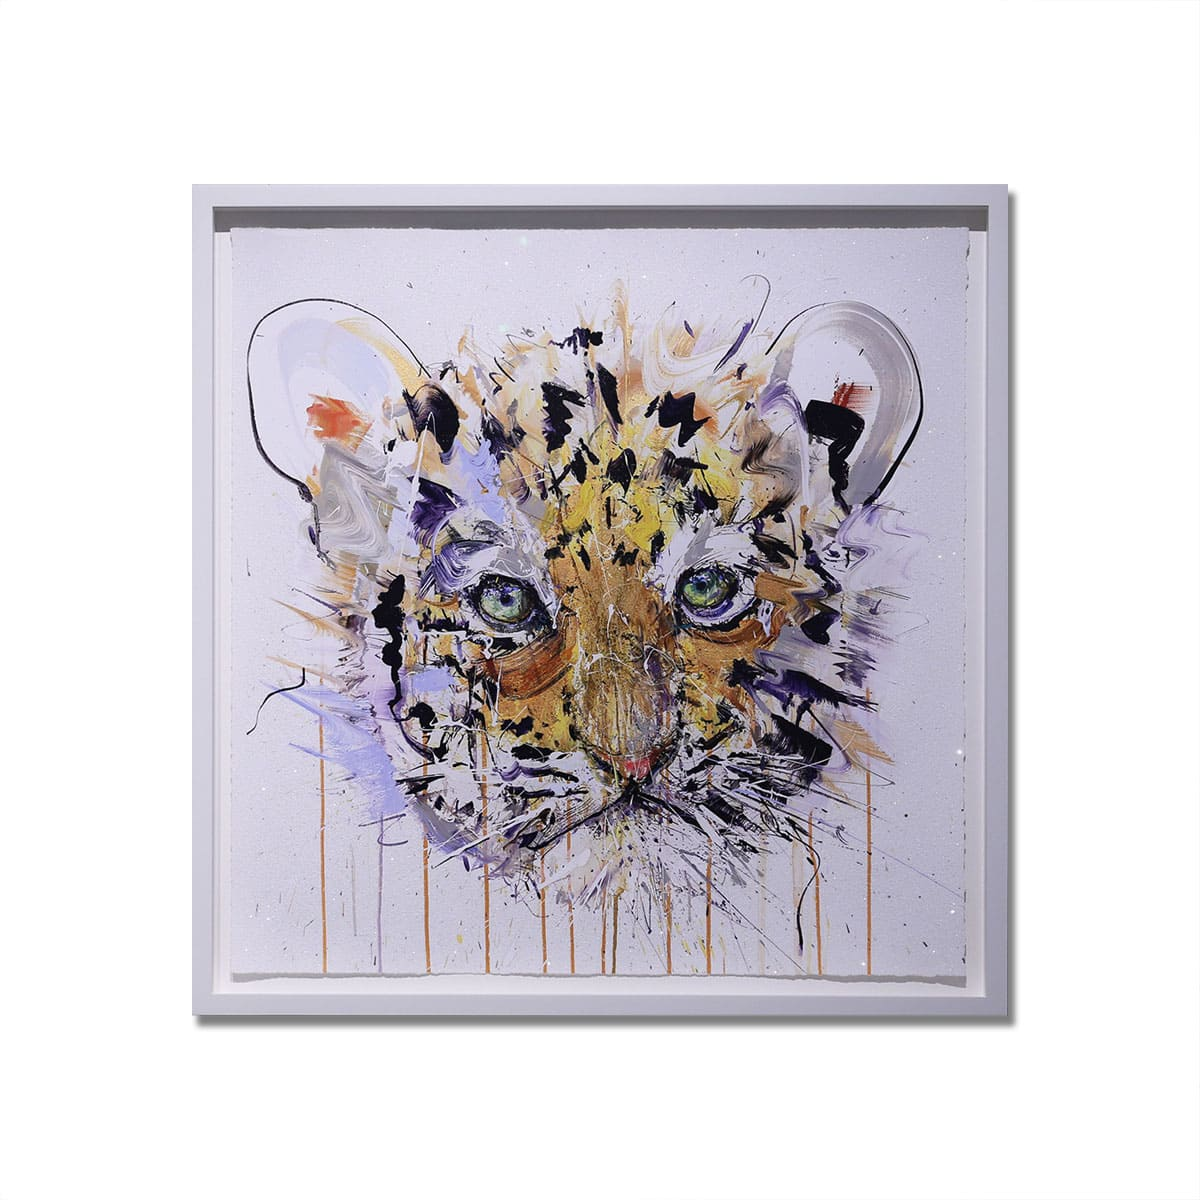 DAVE WHITE Tiger Cub Diamond Dust 19FW-I_photo_large